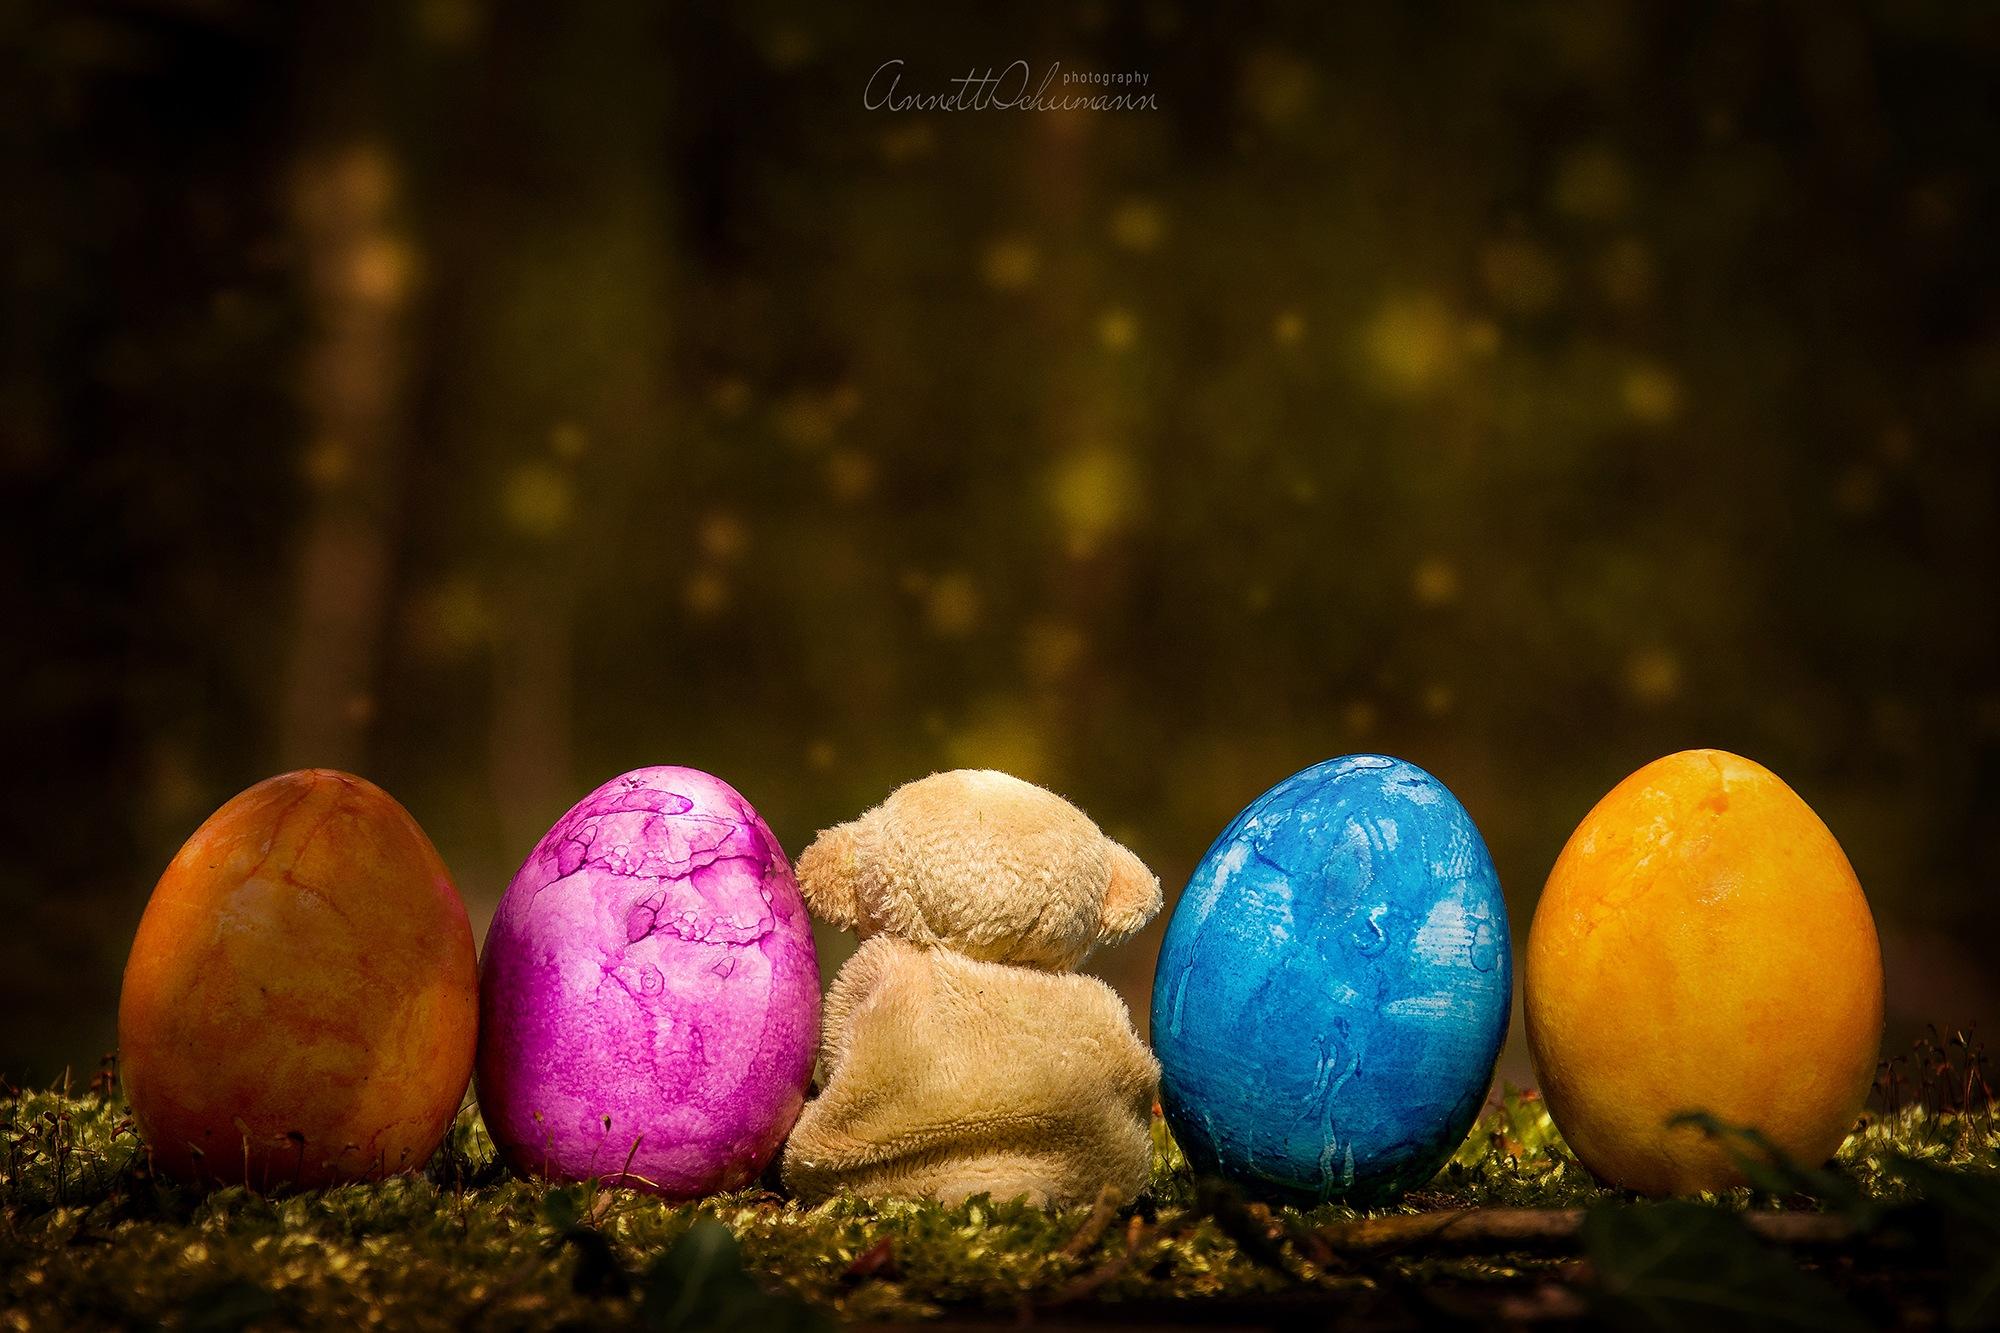 little baer and the easter eggs by Annett Schumann